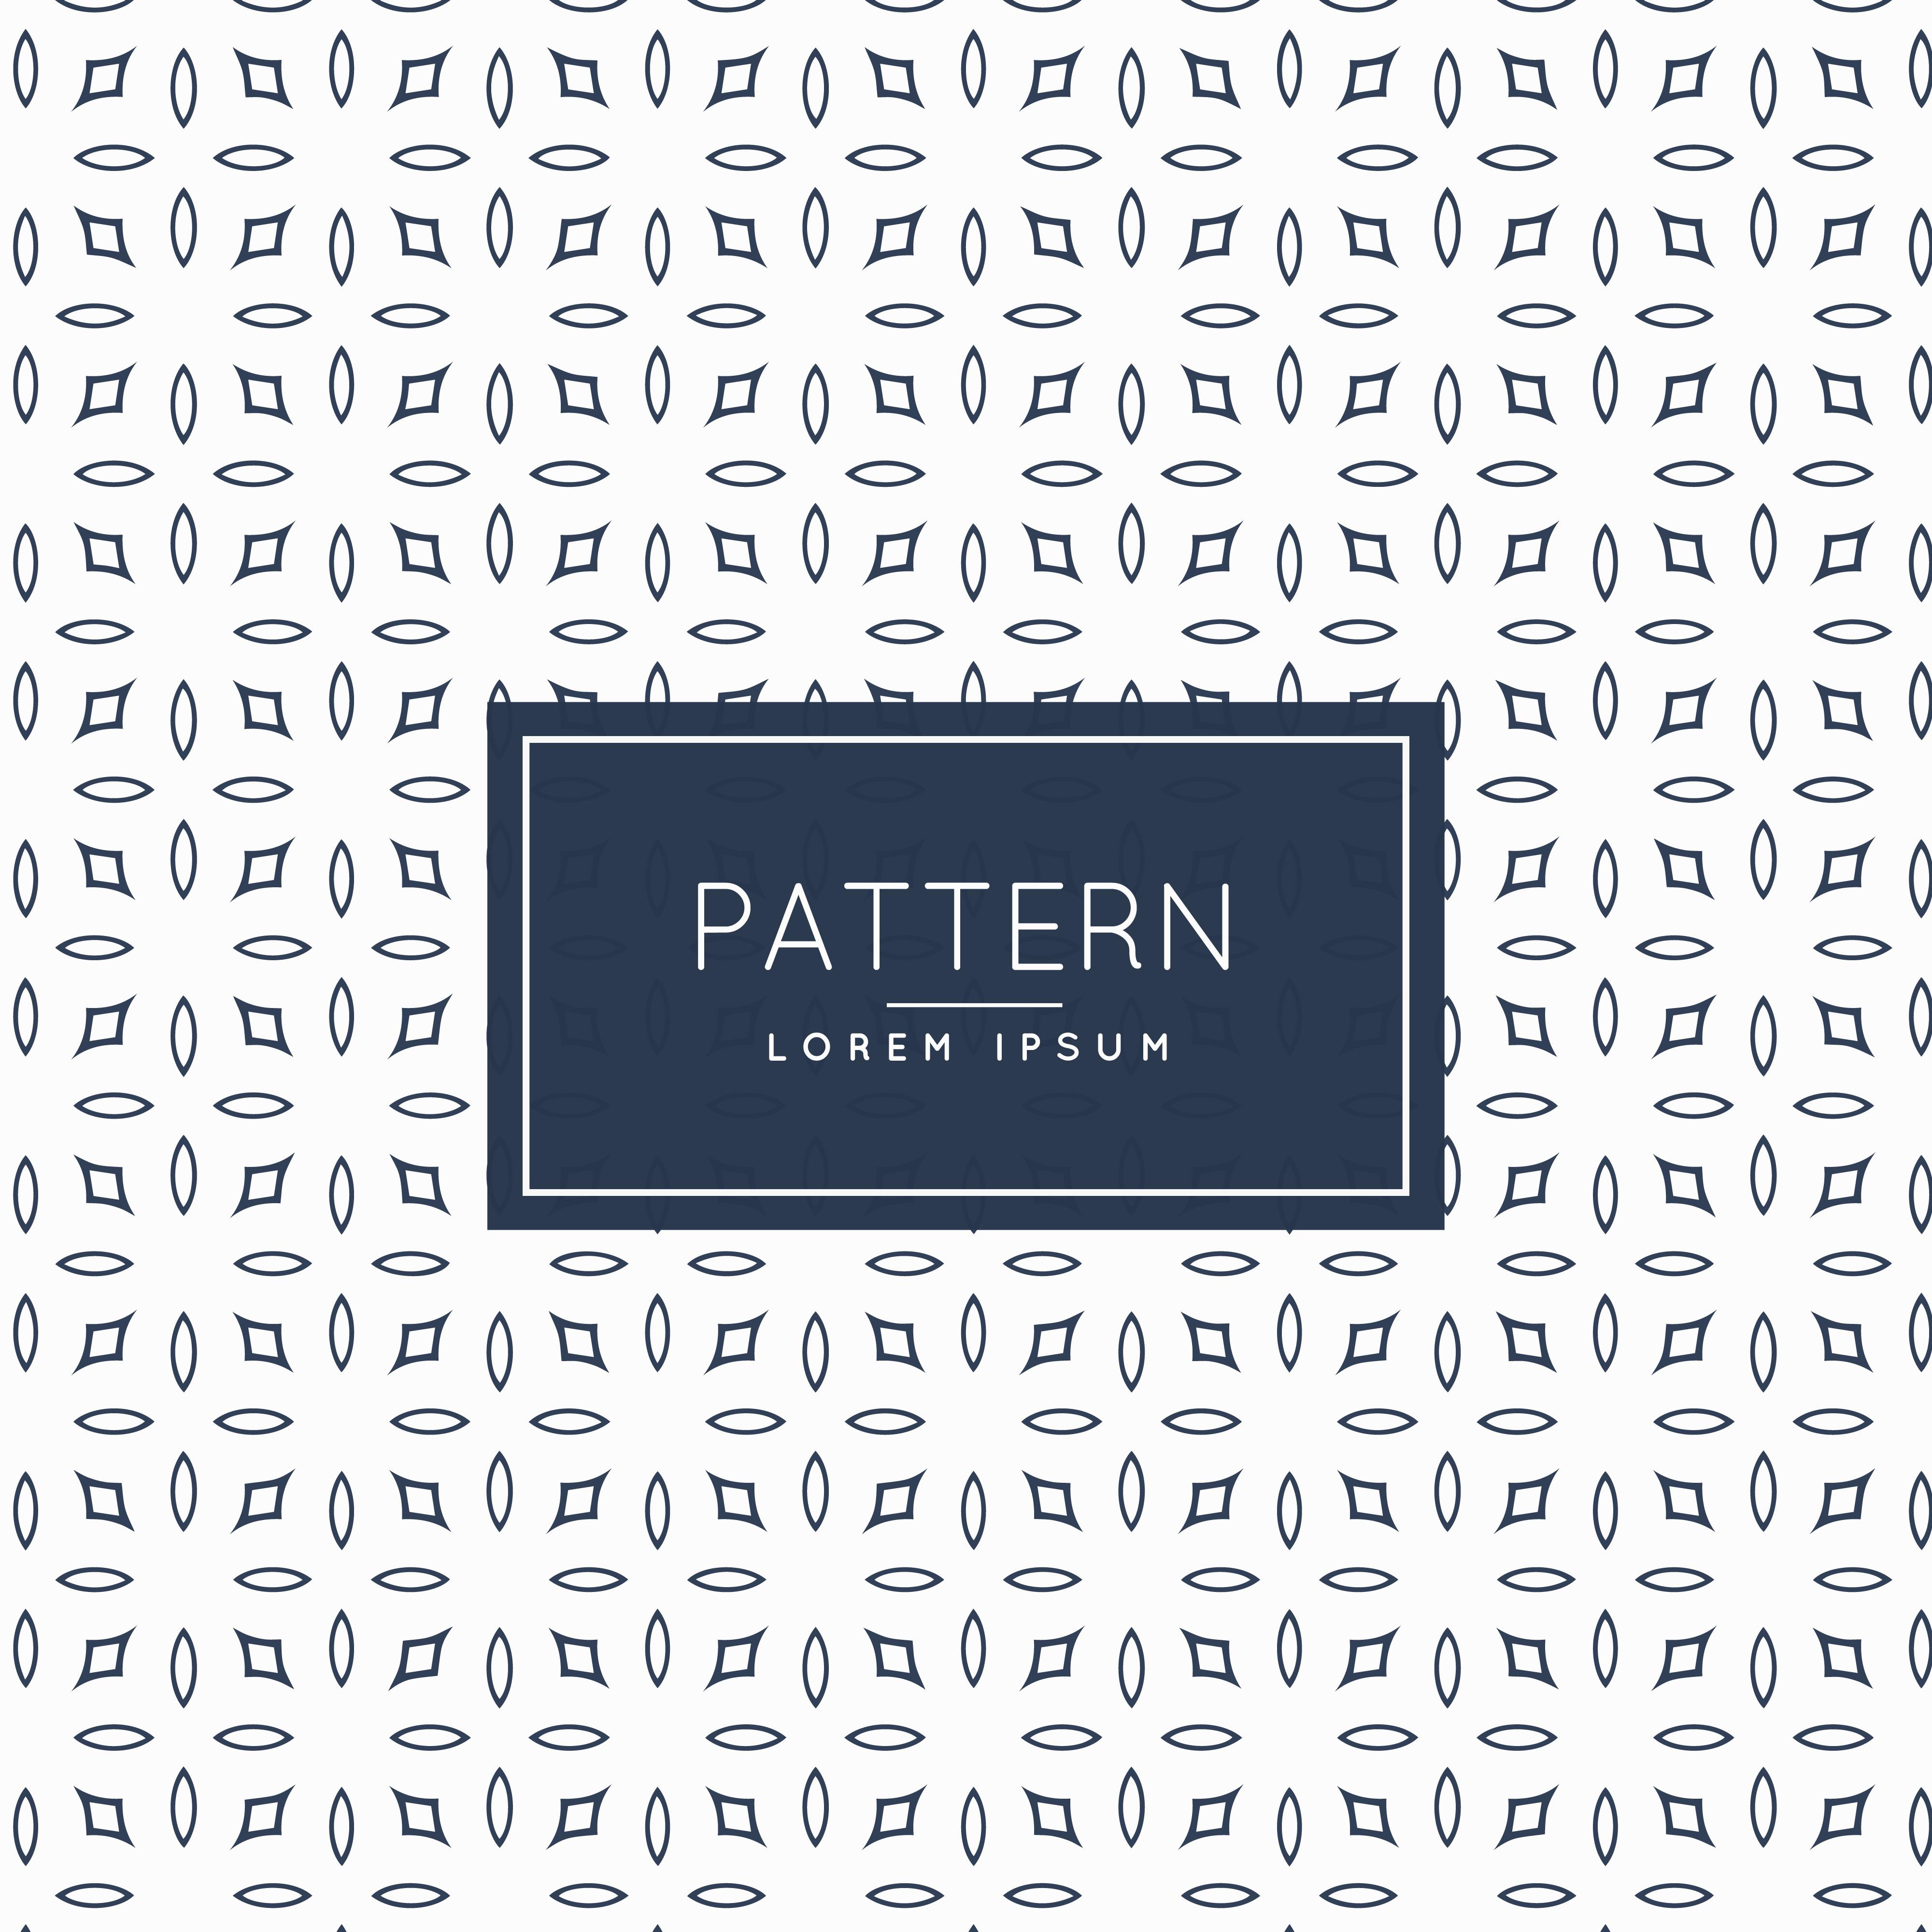 Black Trellis Wallpaper Subtle Pattern Background Download Free Vector Art